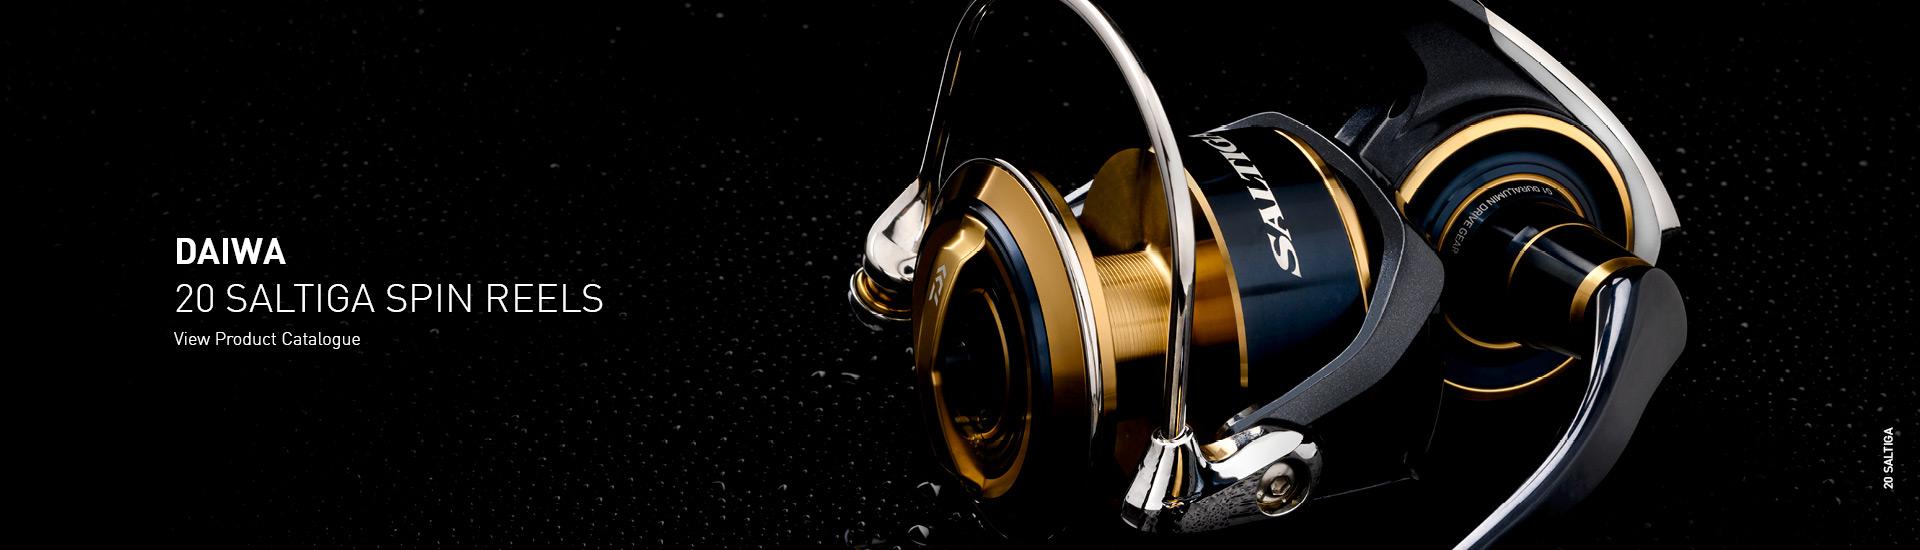 Daiwa 20 Saltiga Spinning Reel Hero Image LG